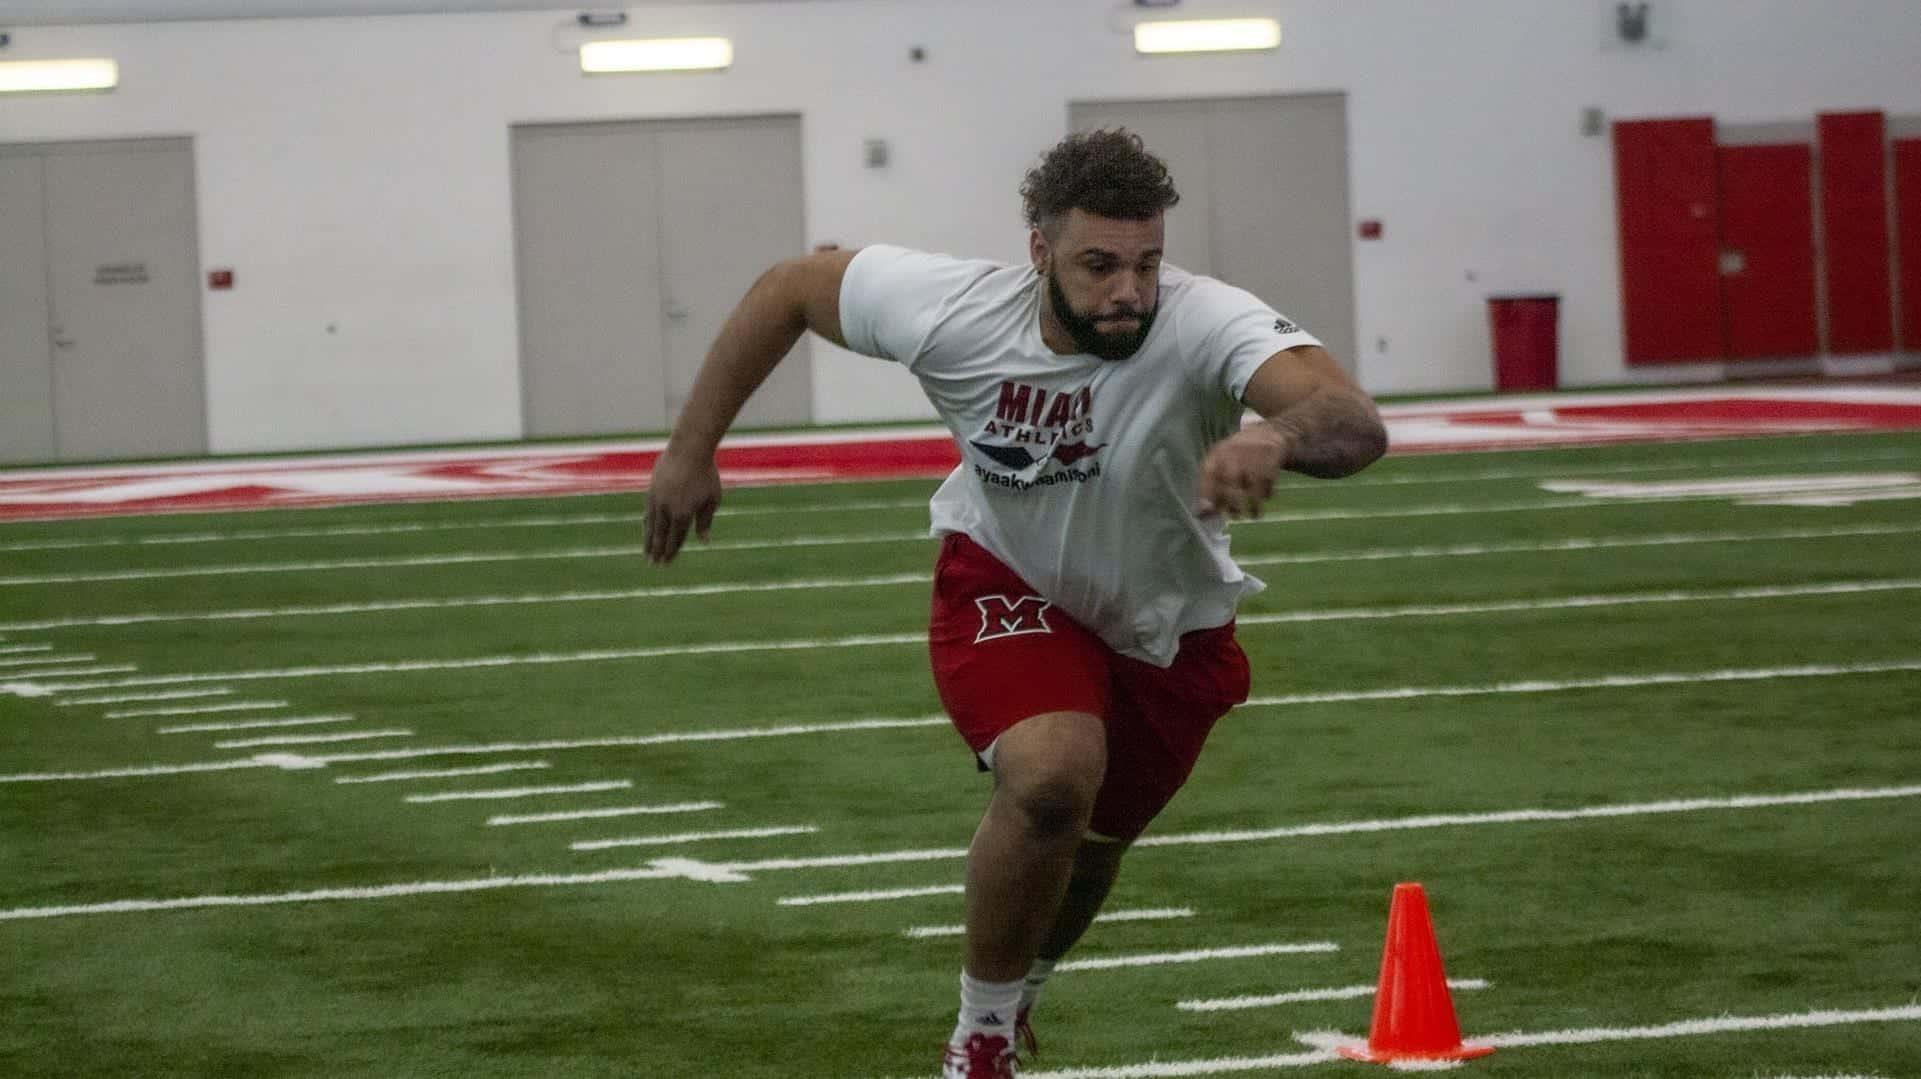 2020 NFL Draft: Miami RedHawks Pro Day Report